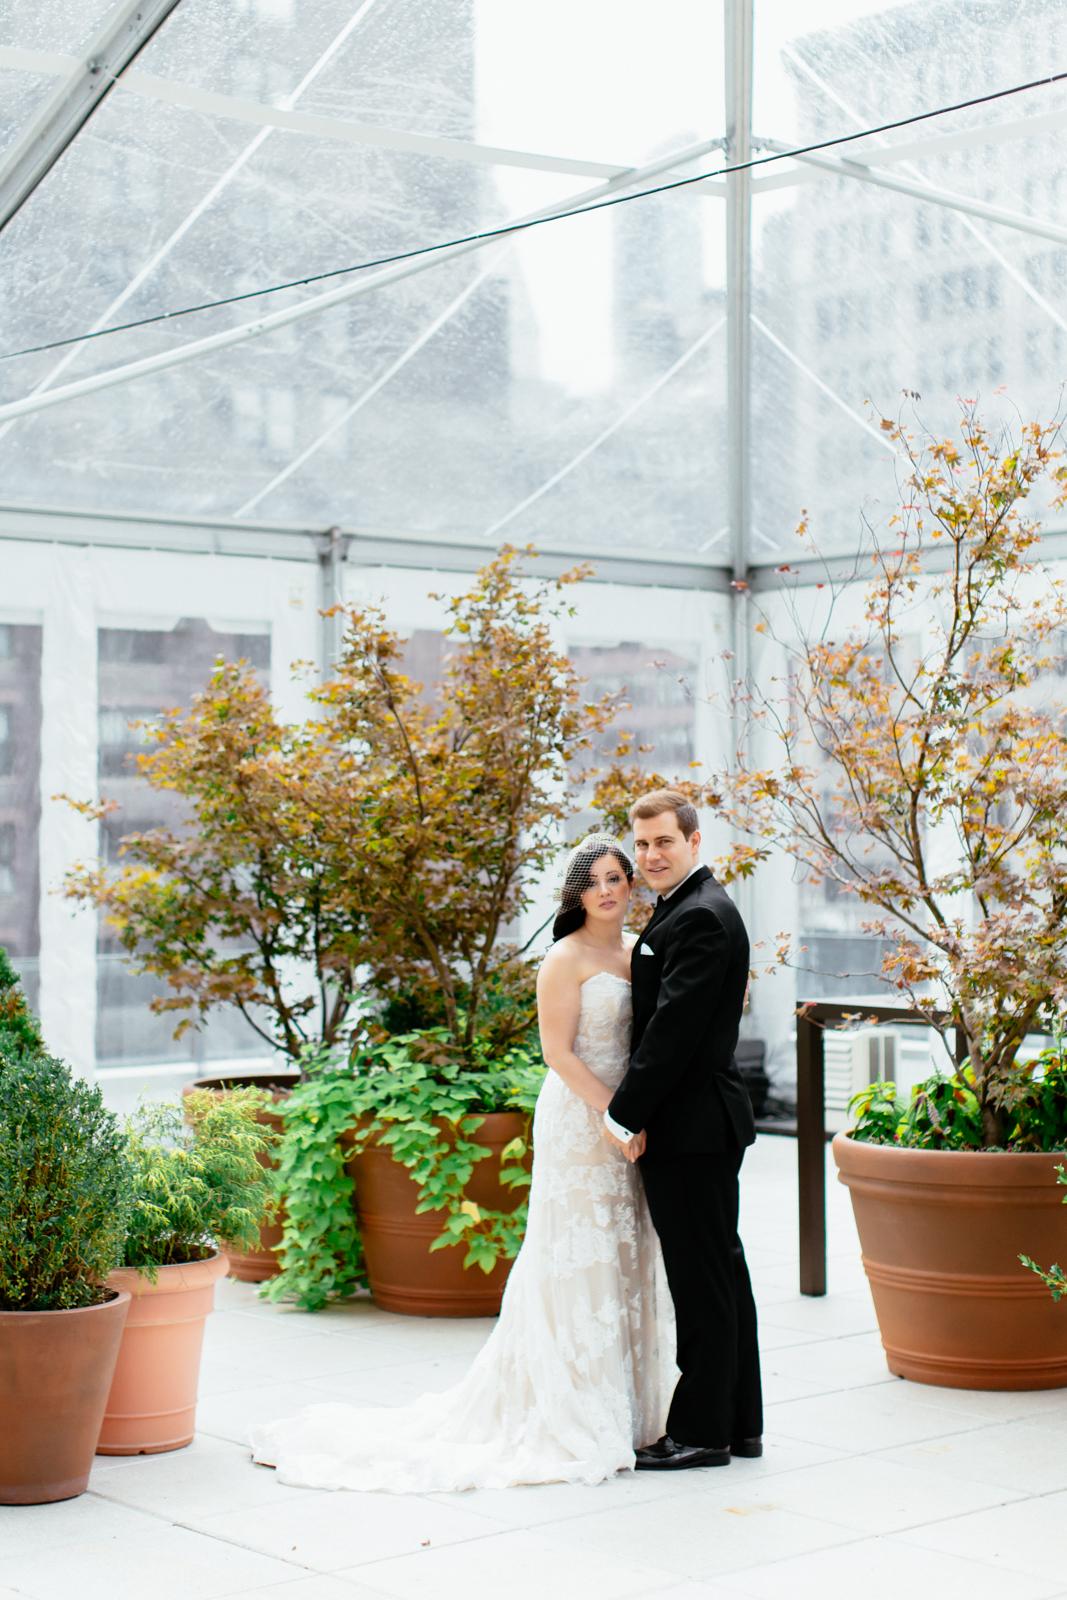 NYC Wedding Photography Lofts at Prince Brooklyn NYC Photographer Boris Zaretsky _B2C7350.jpg